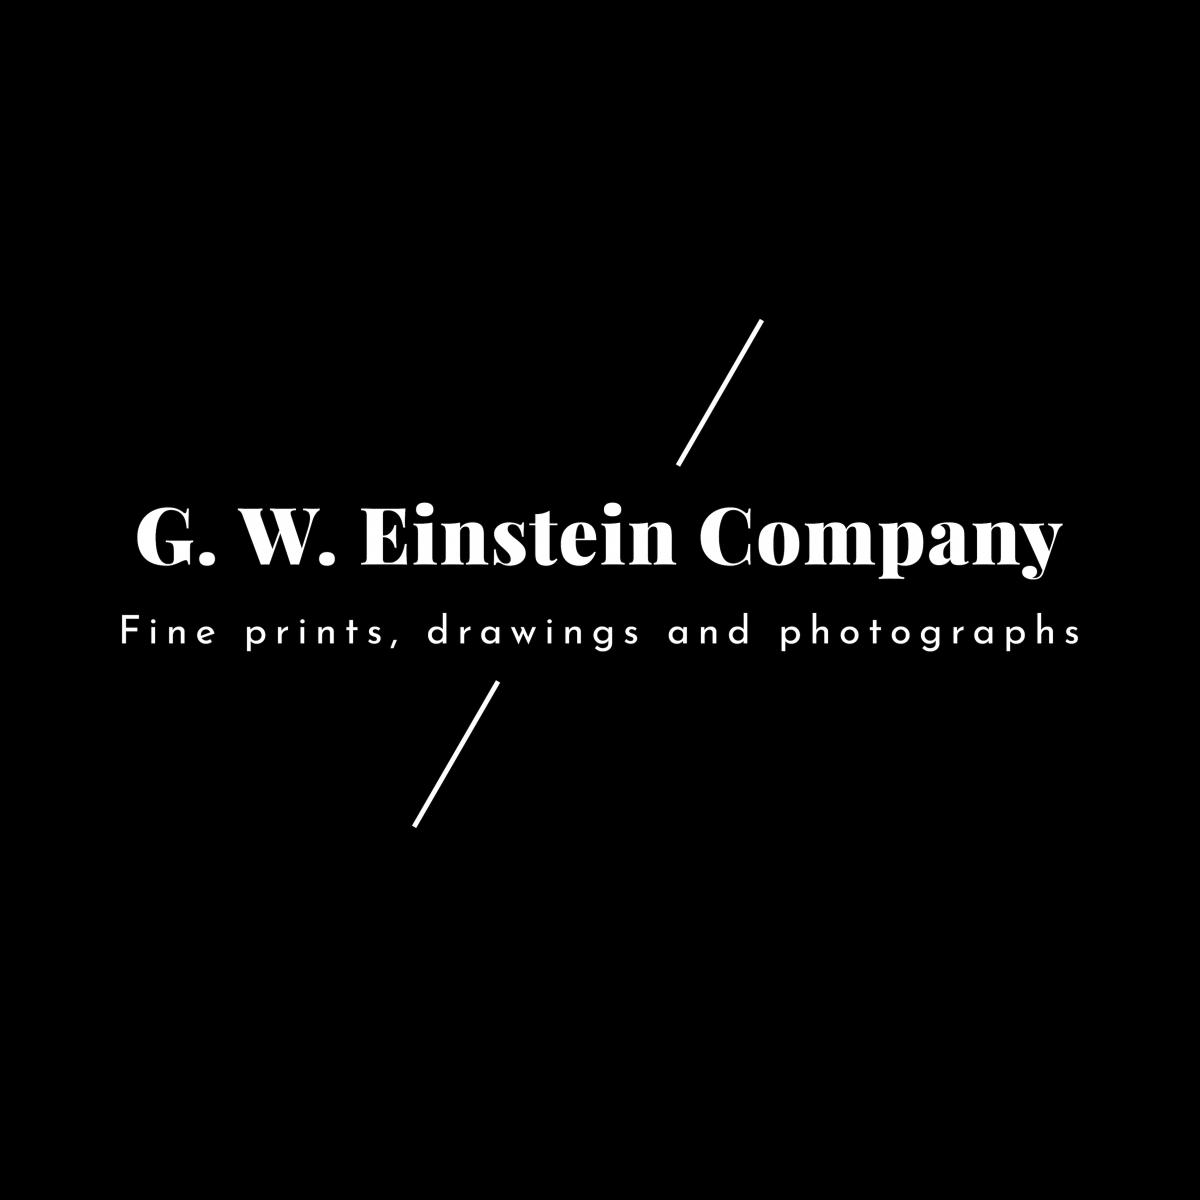 G.W. Einstein Company